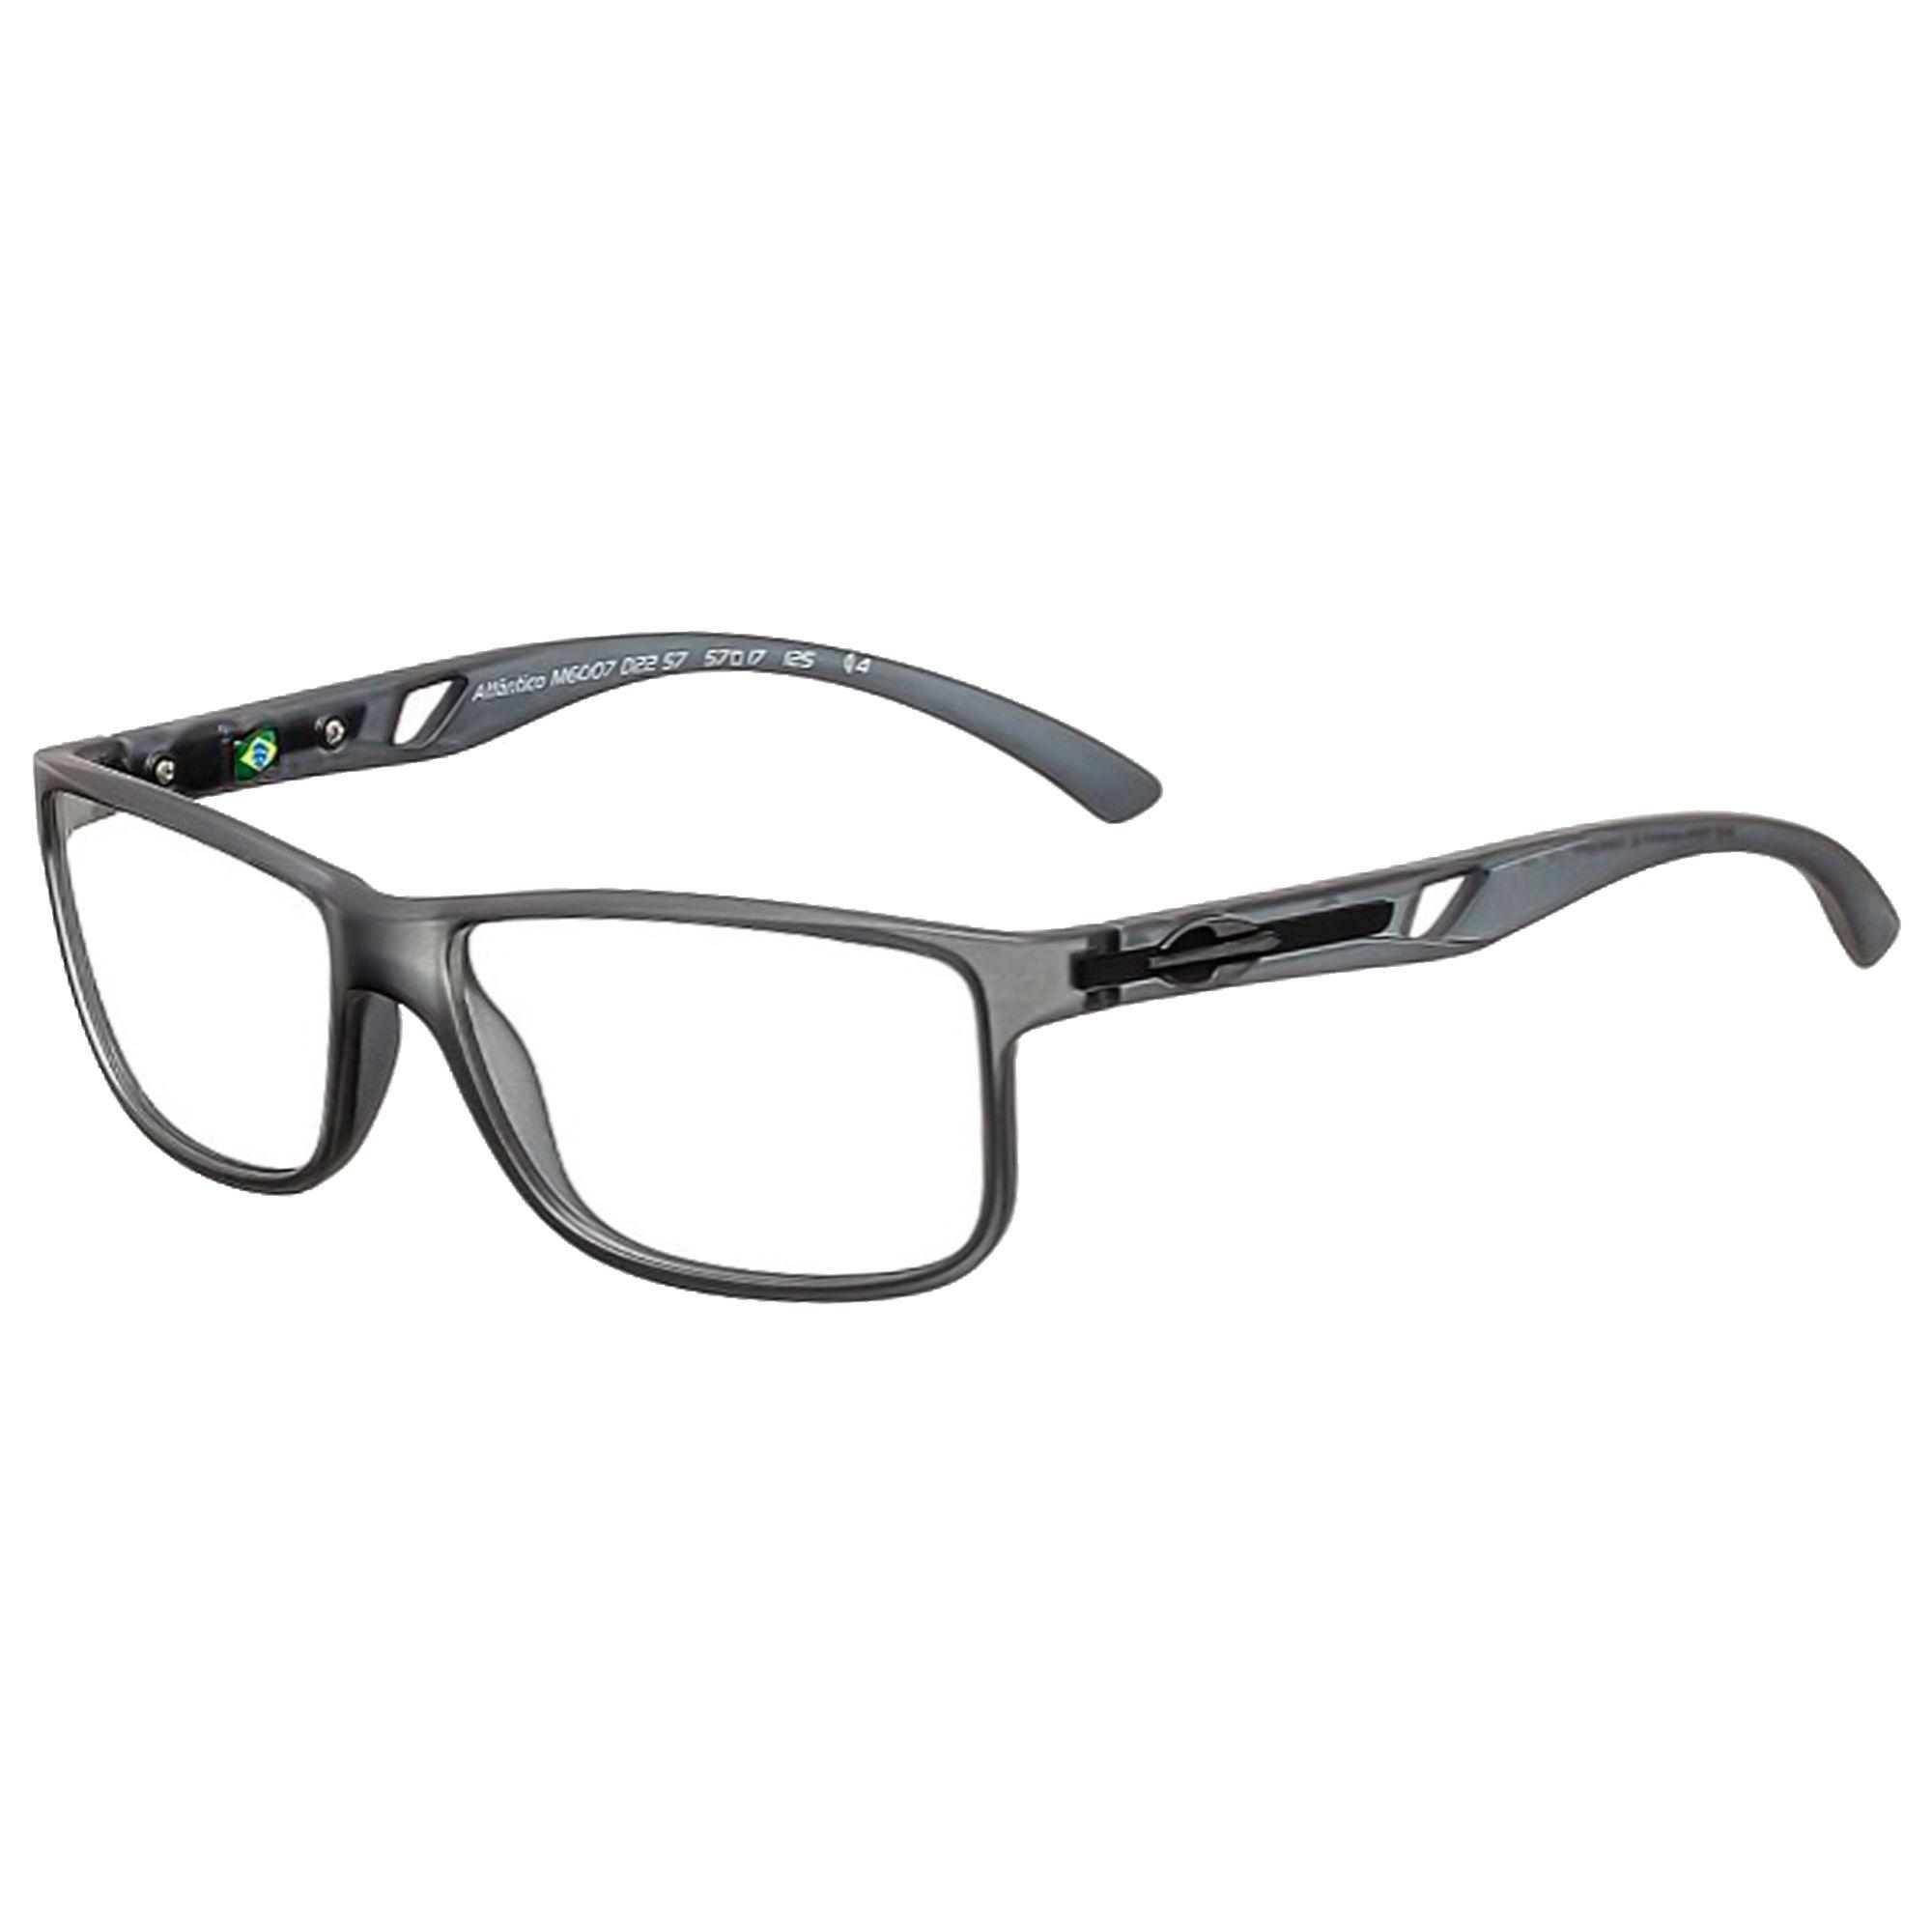 Óculos de Grau Masculino Mormaii Atlantico M6007D2257